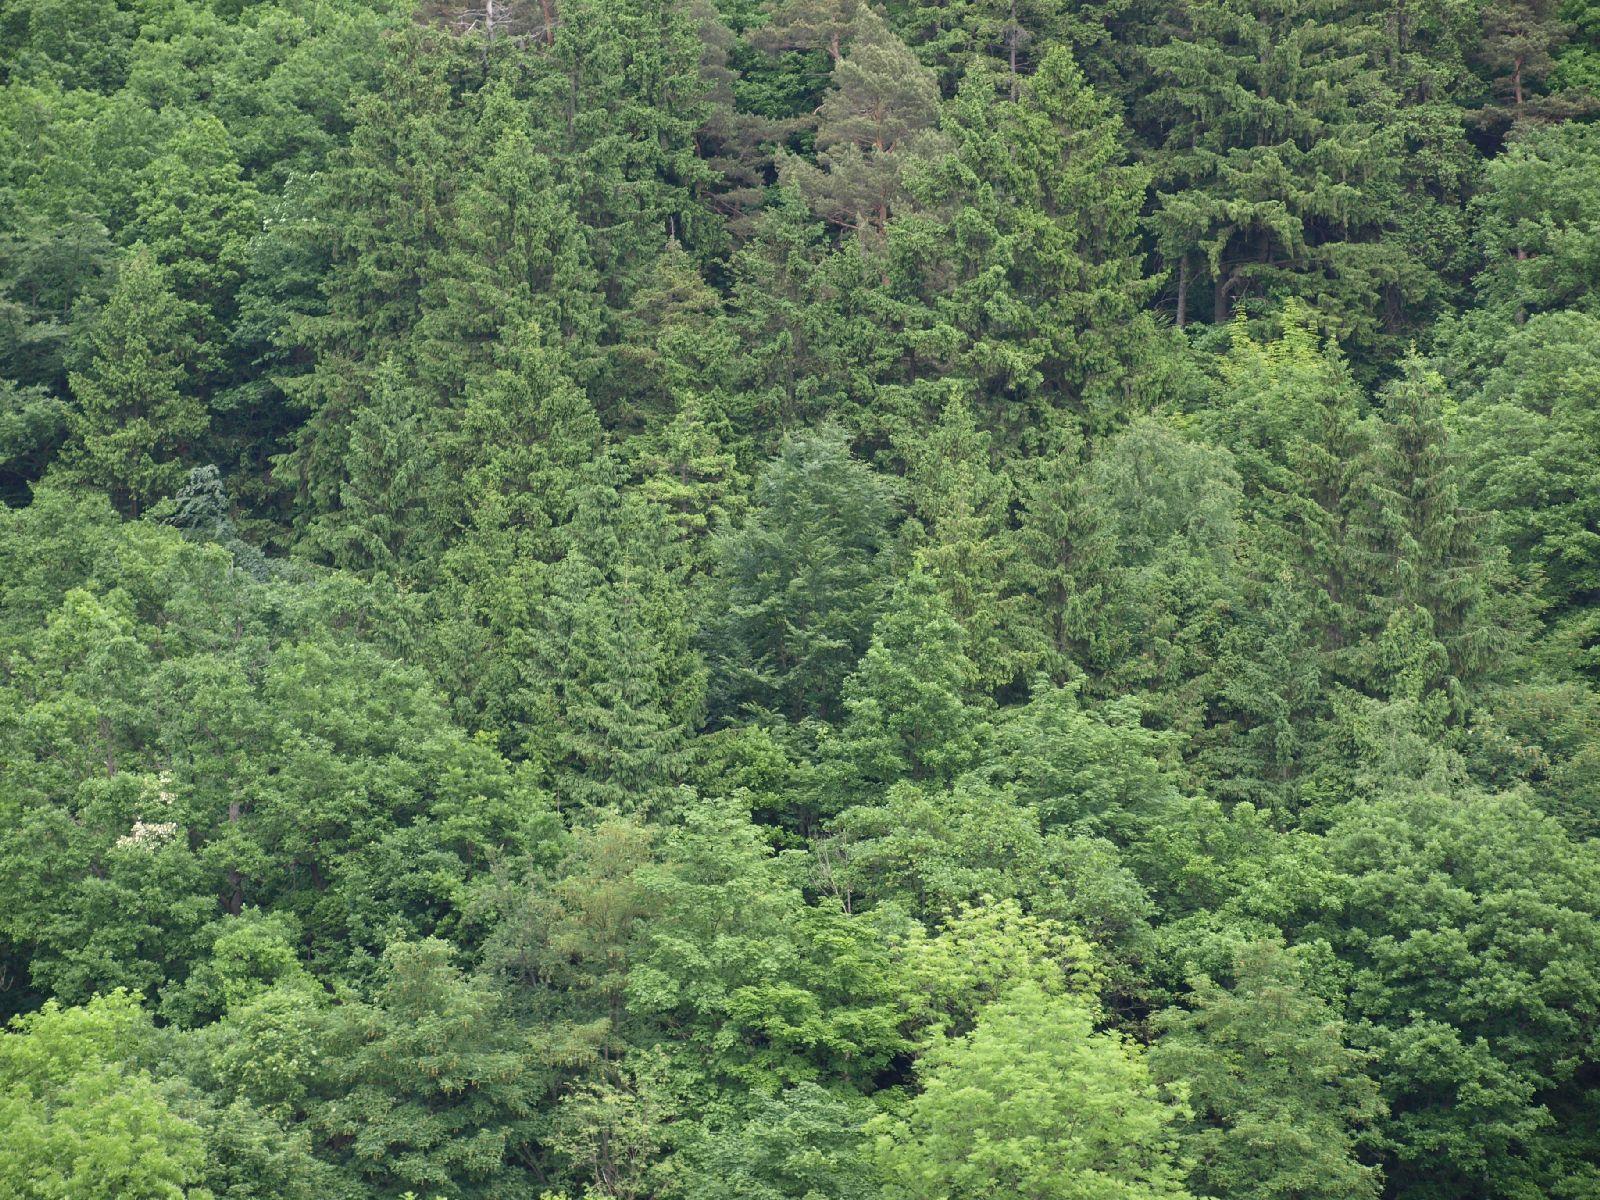 Plants-Trees_Photo_Texture_B_P6036442